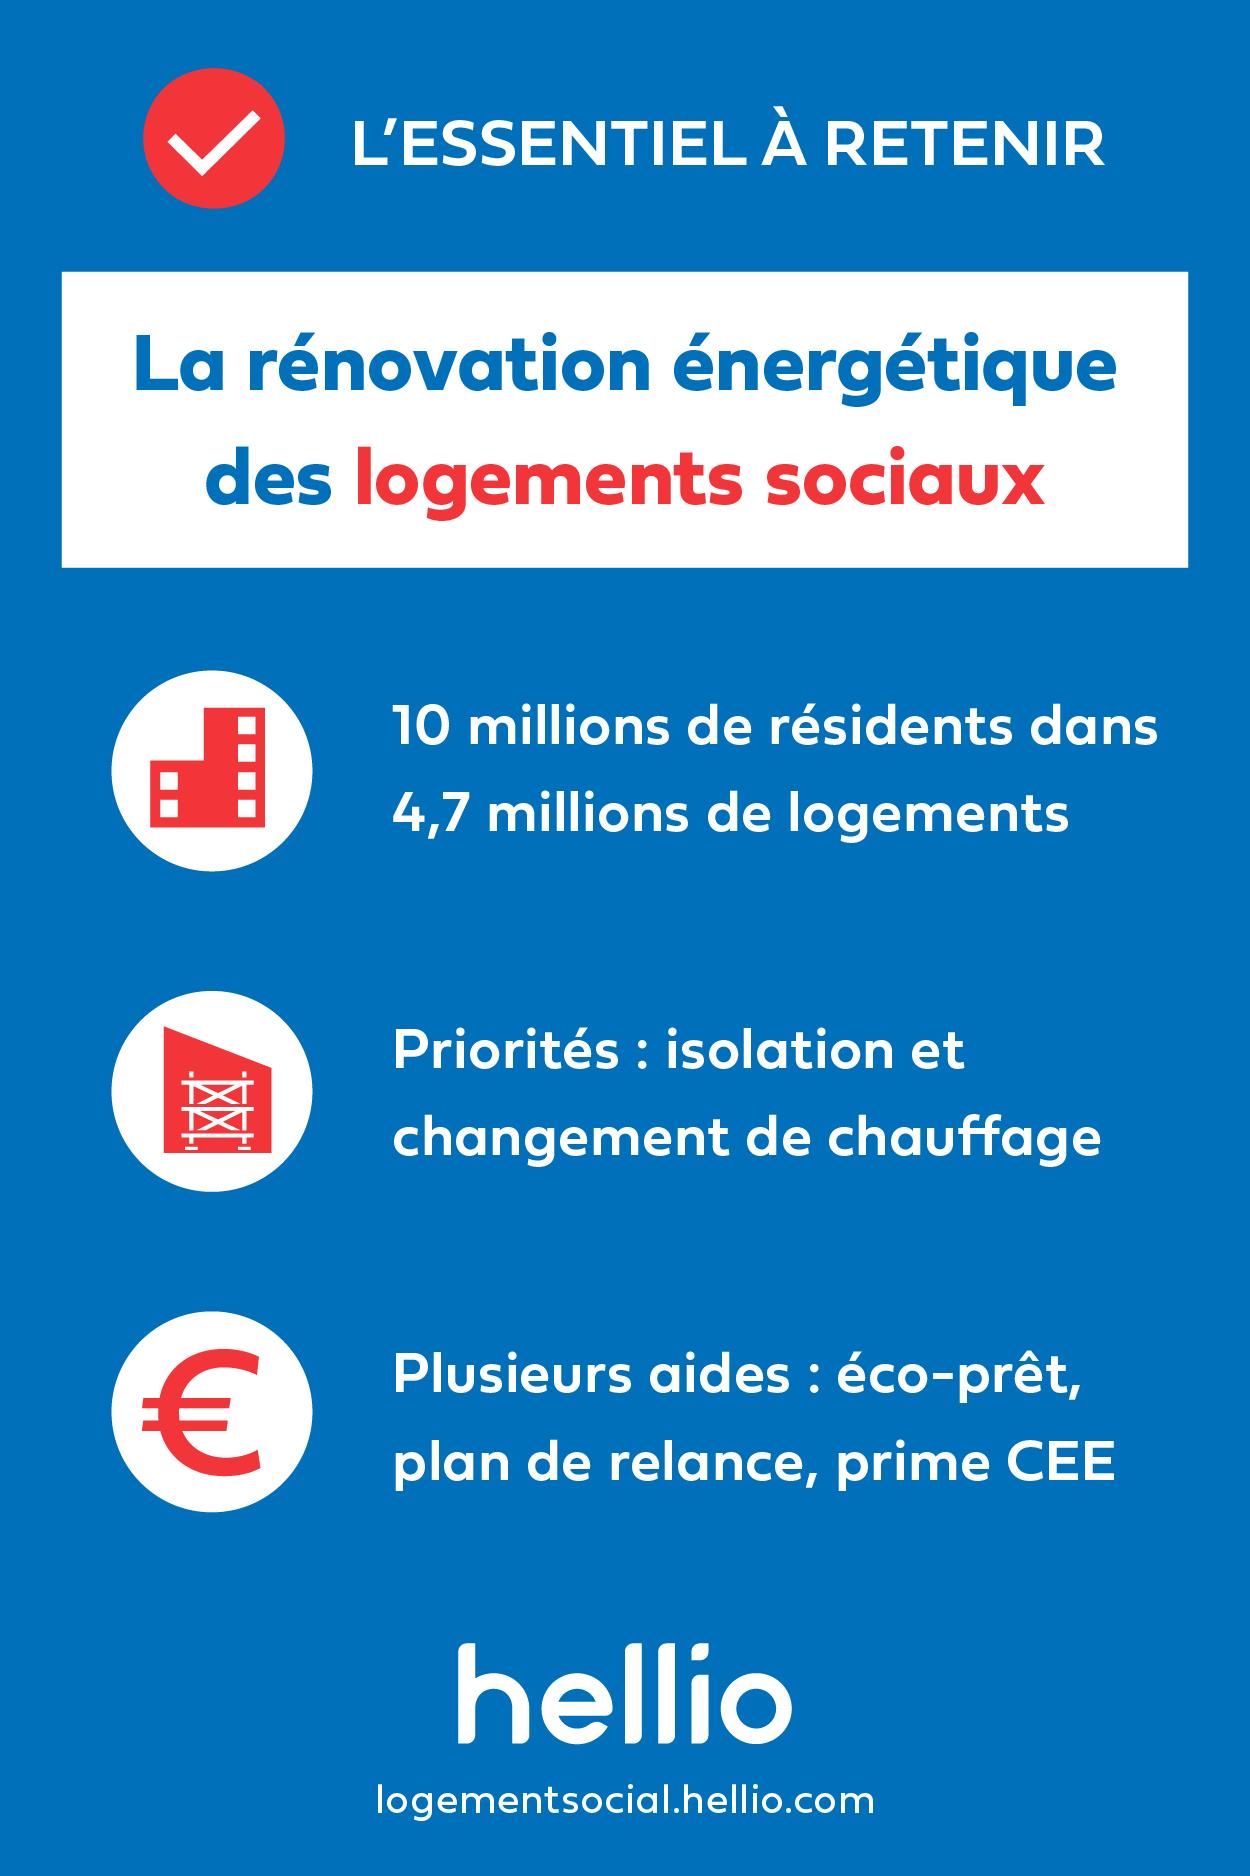 infographie-essentiel-retenir-hellio-copropriete-renovation-logement-social